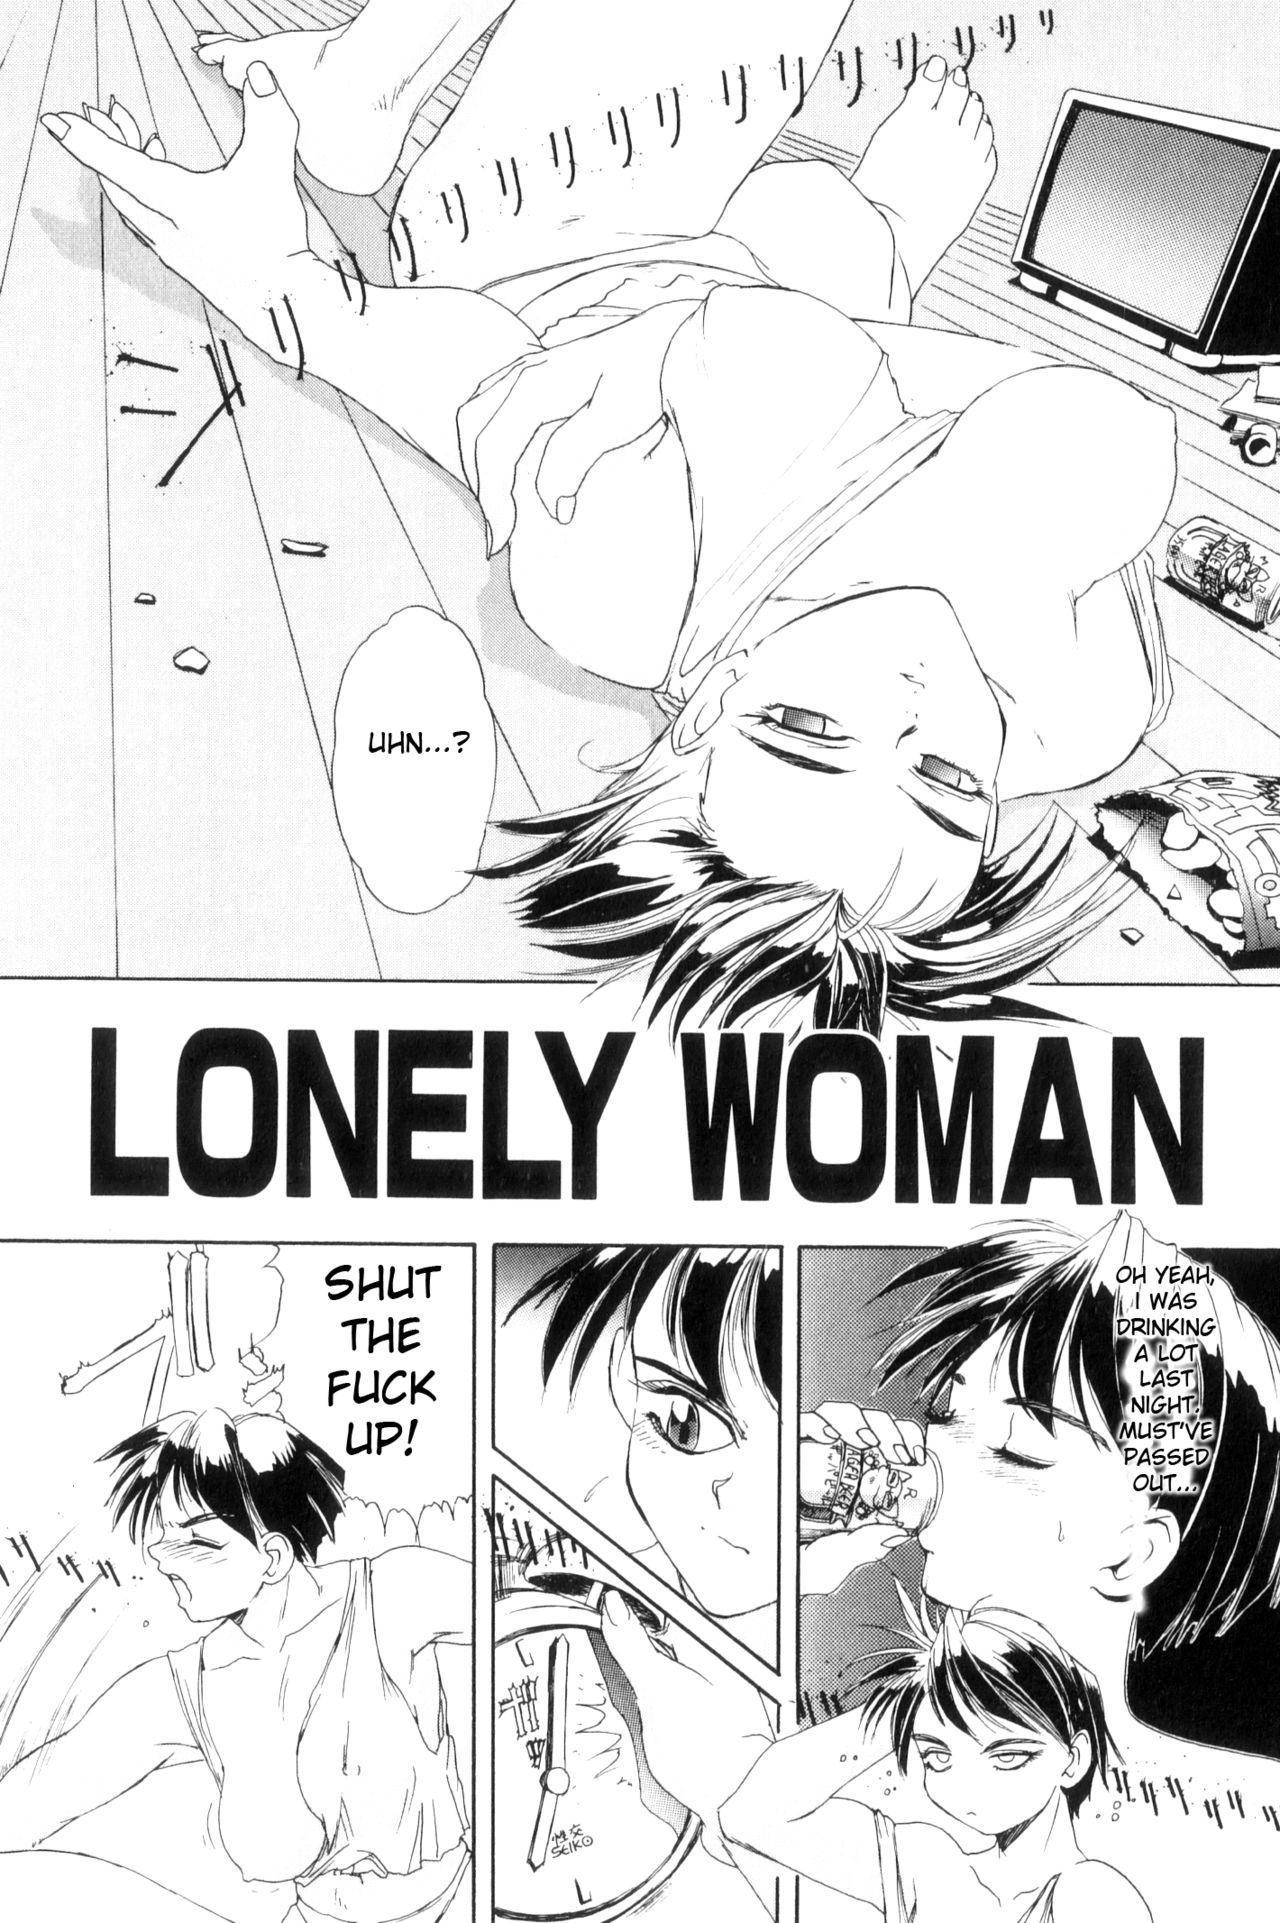 [NeWMeN] Secret Plot [Shinsouban] Ch. 1-6 [English] 130